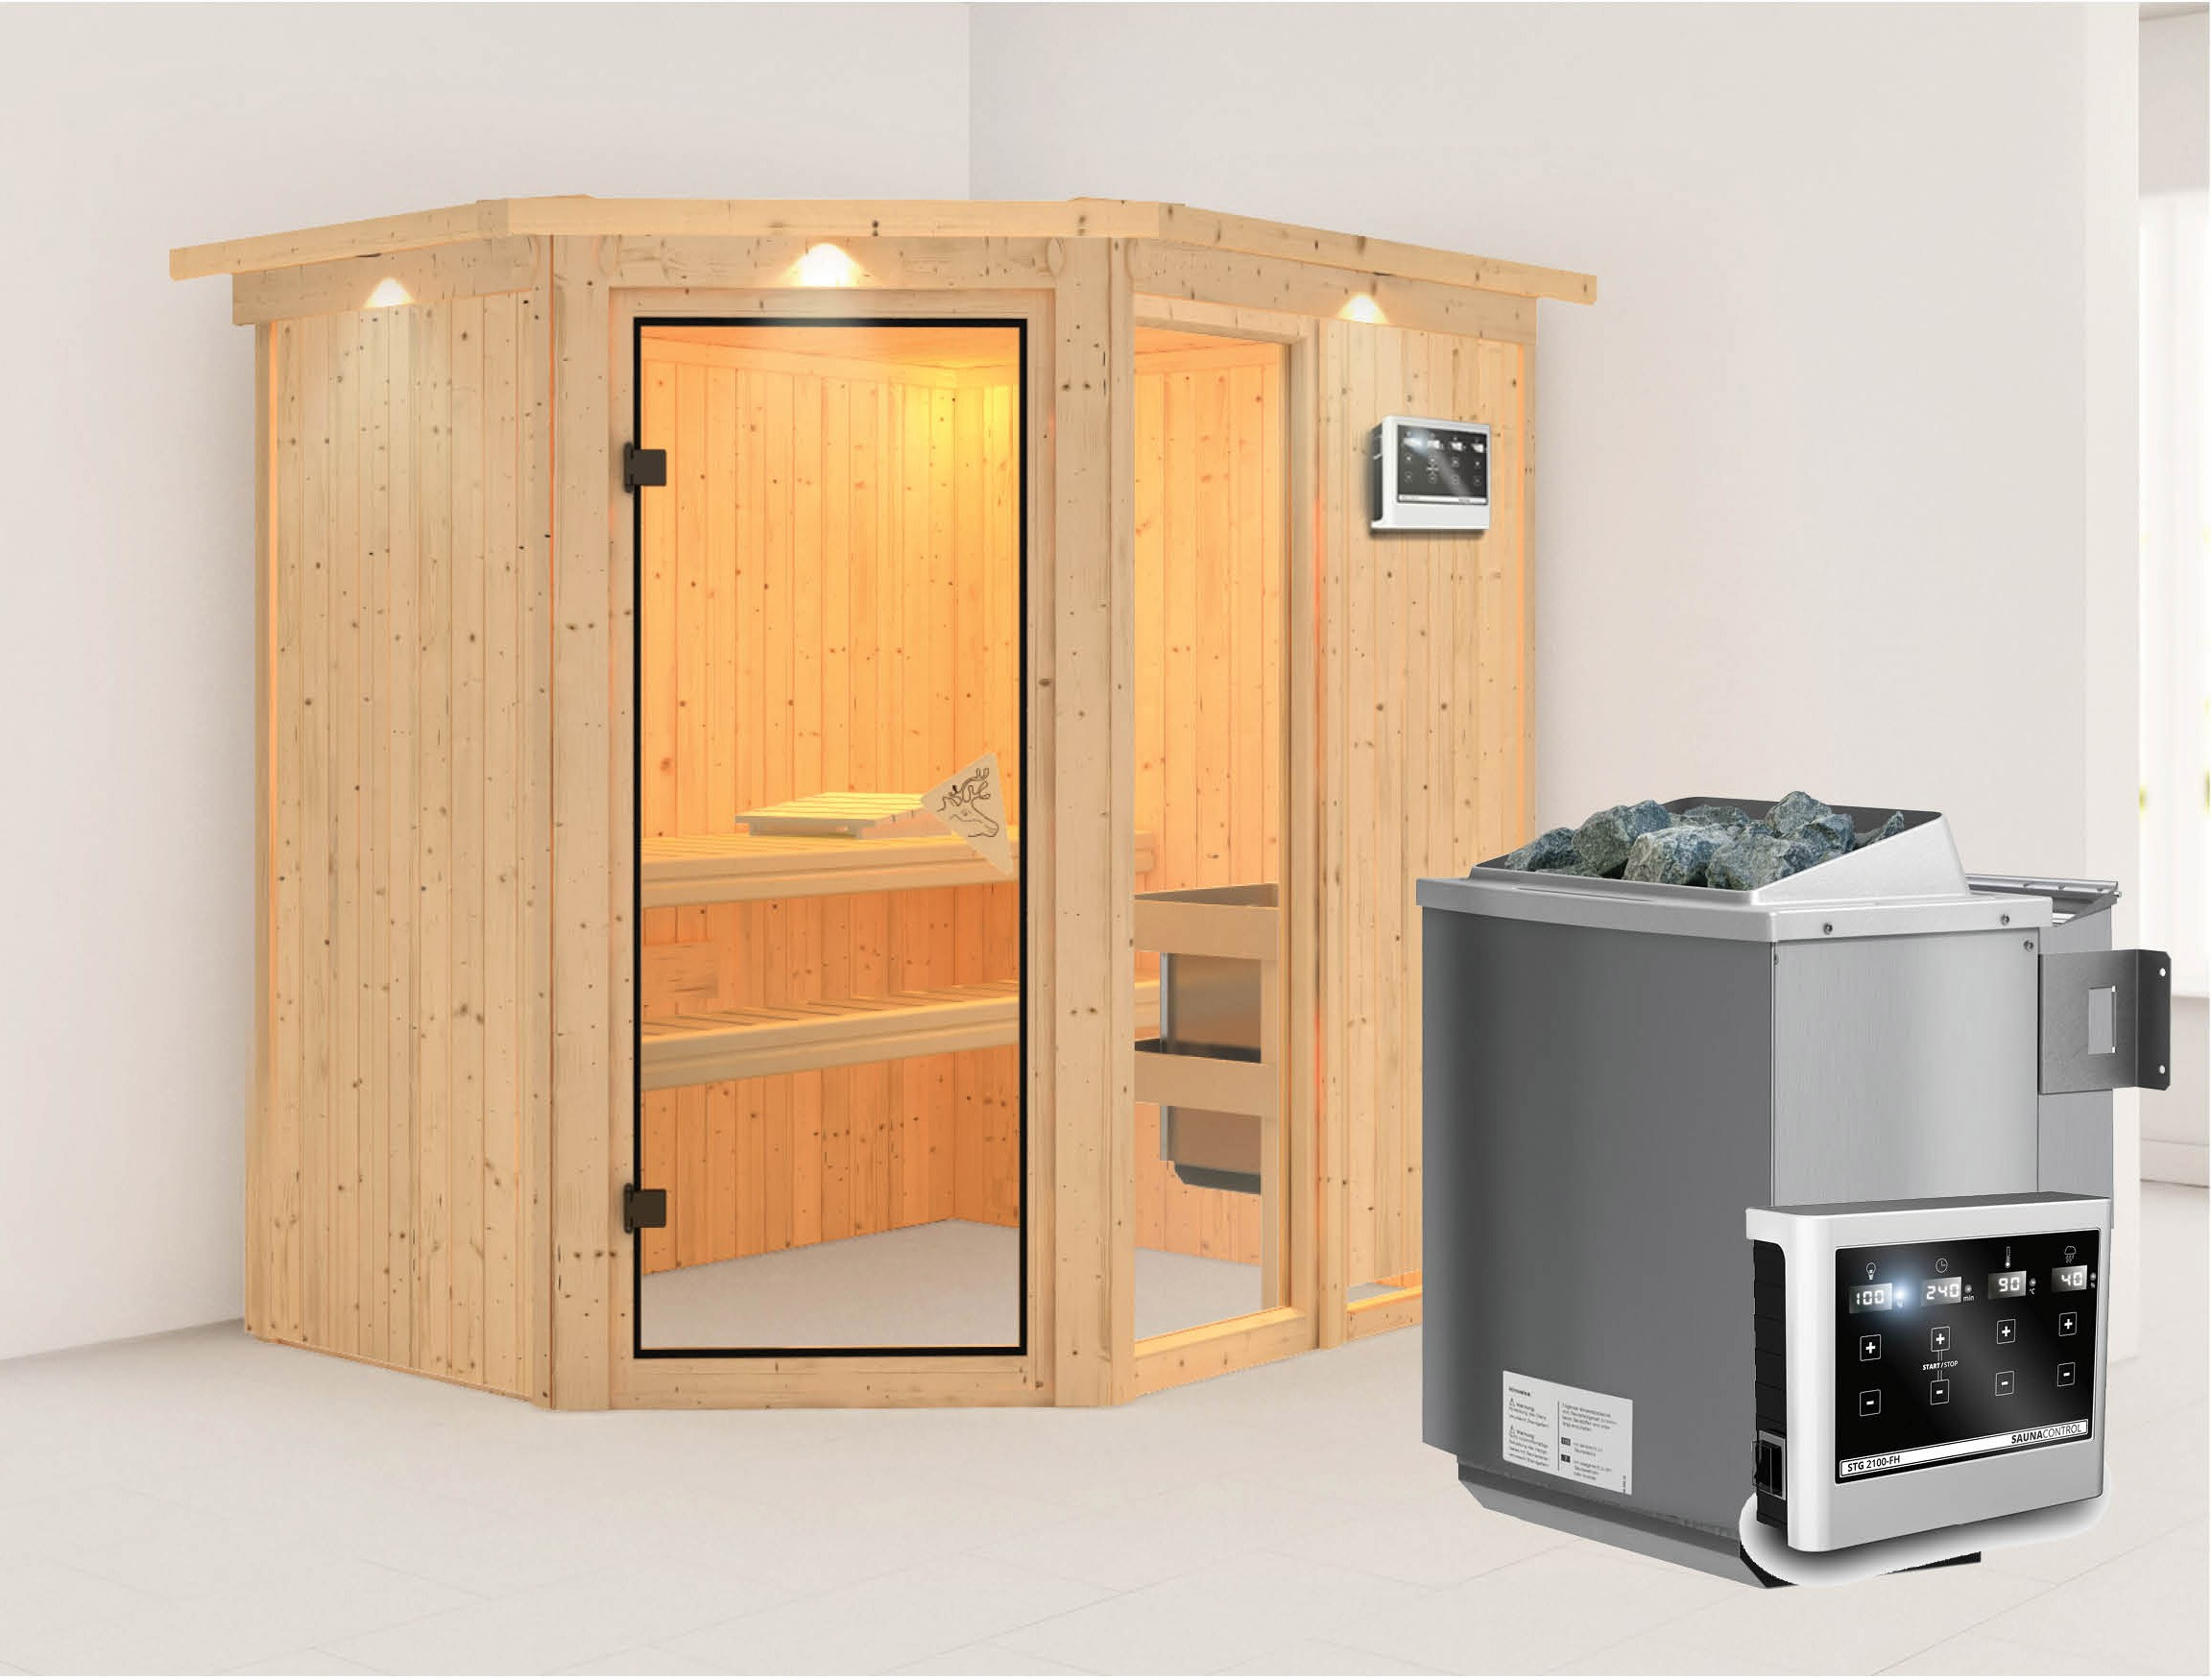 Karibu Sauna Fiona 1 68mm Dachkranz + Bio Ofen 9kW extern classic Tür Bild 1